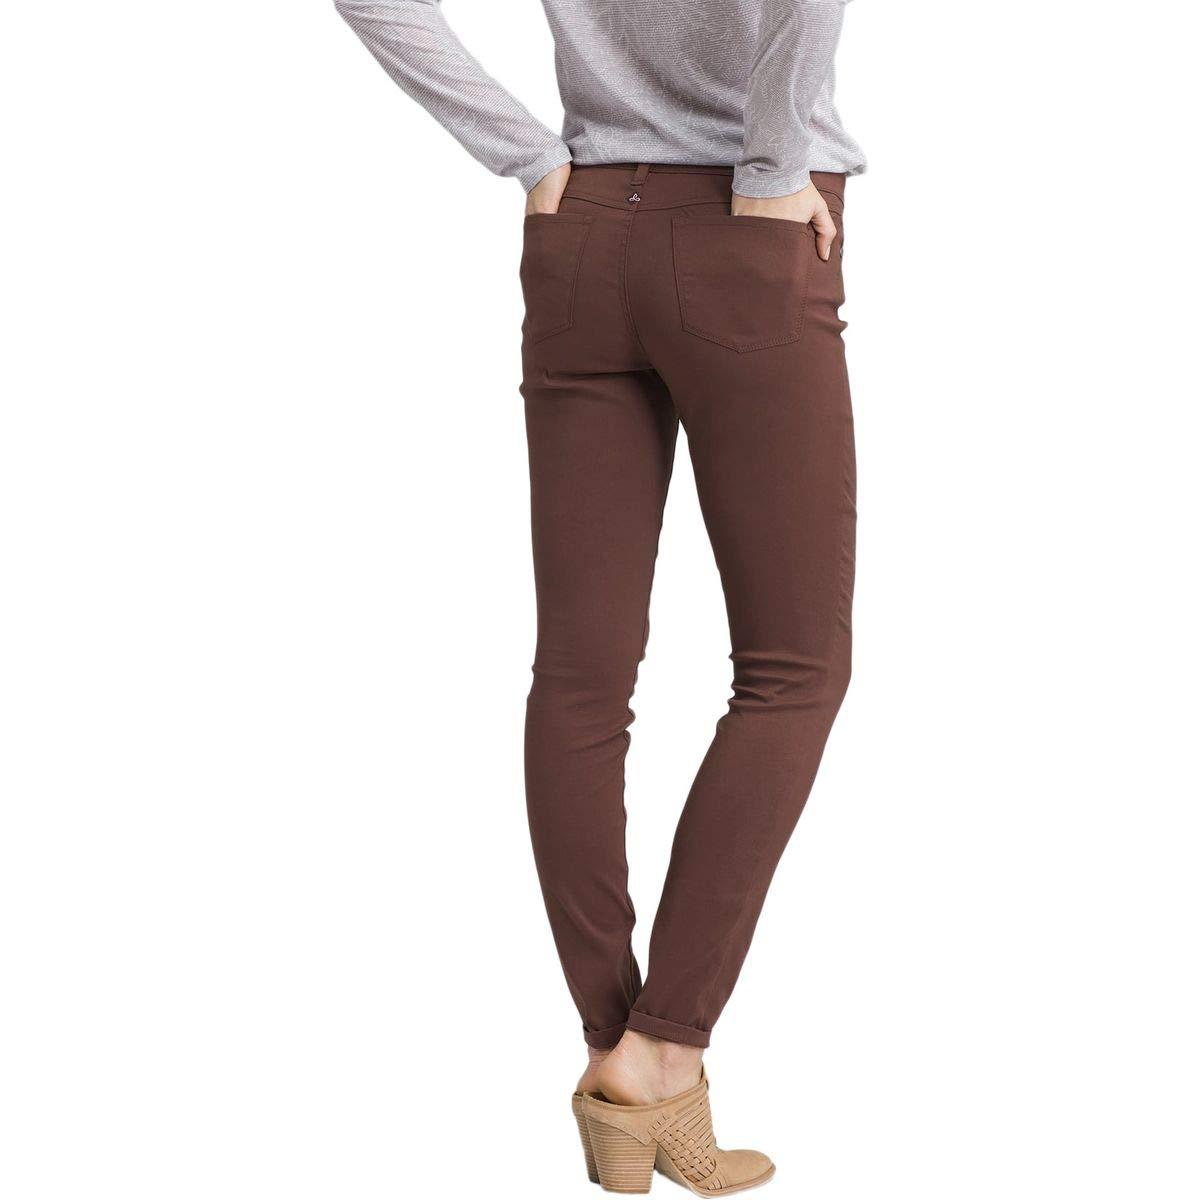 prAna Women's Regular Inseam Briann Pants, 6, Wedge Wood by prAna (Image #2)